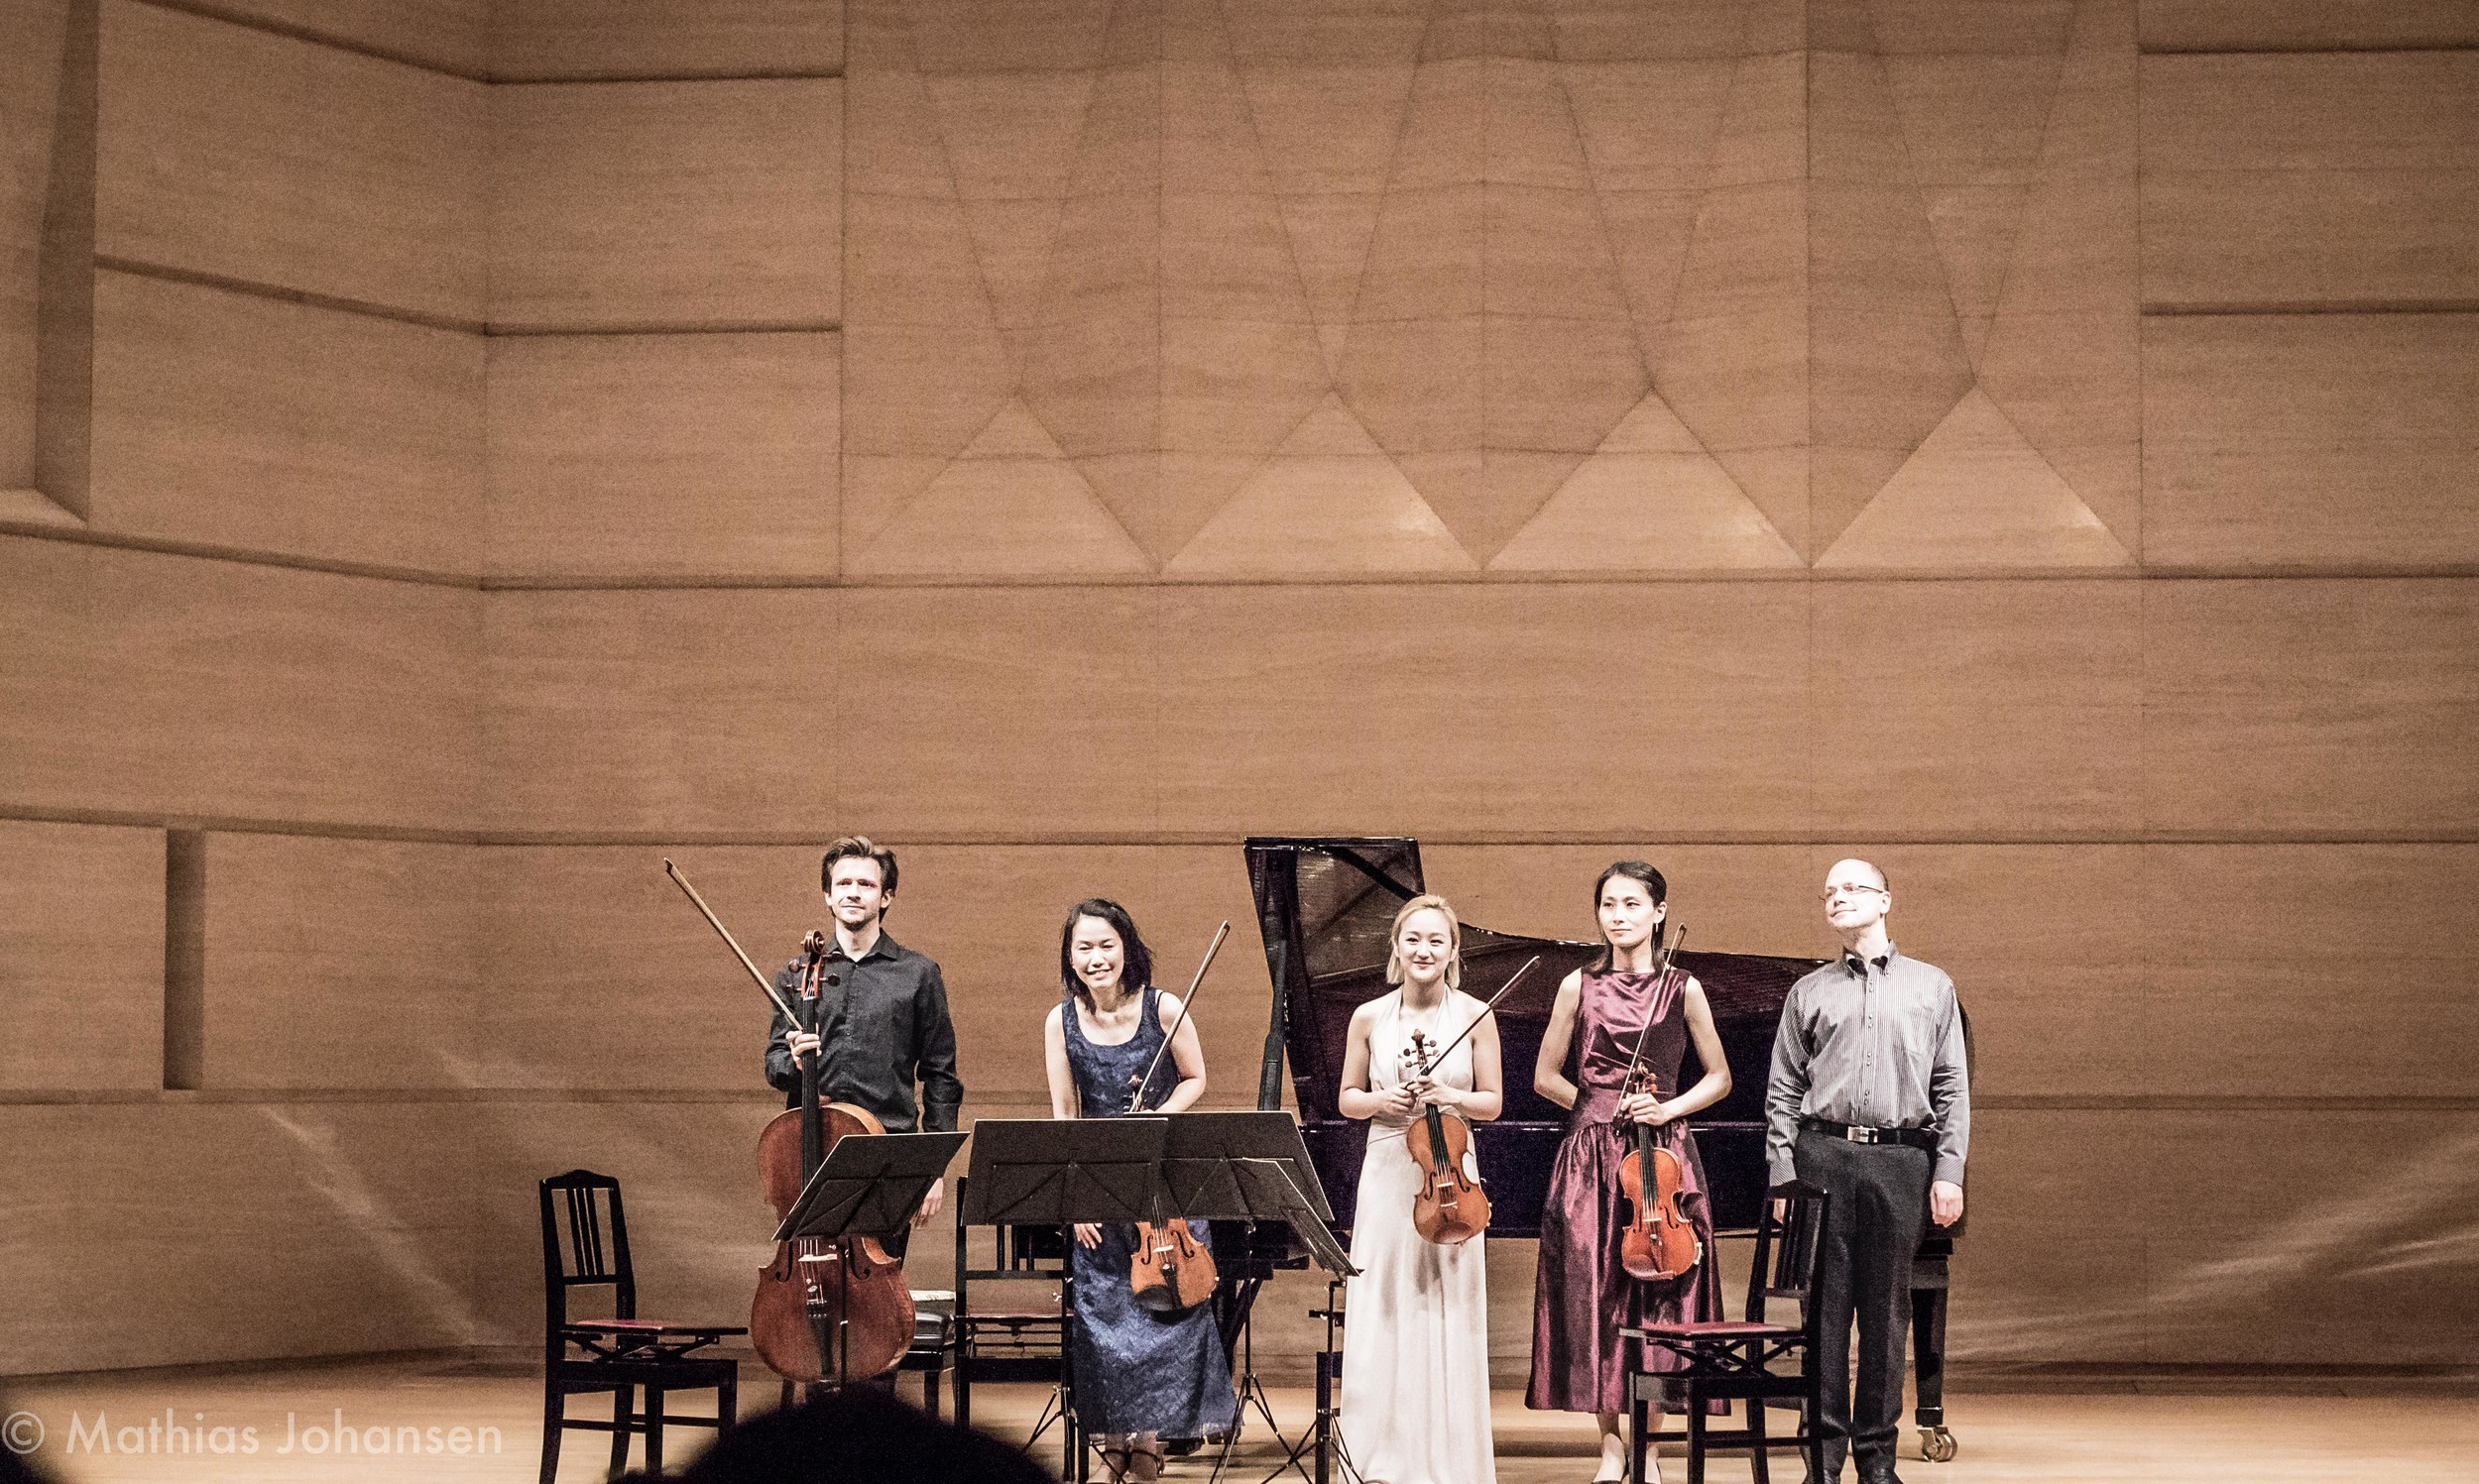 Masters Concert in Nagoya #6